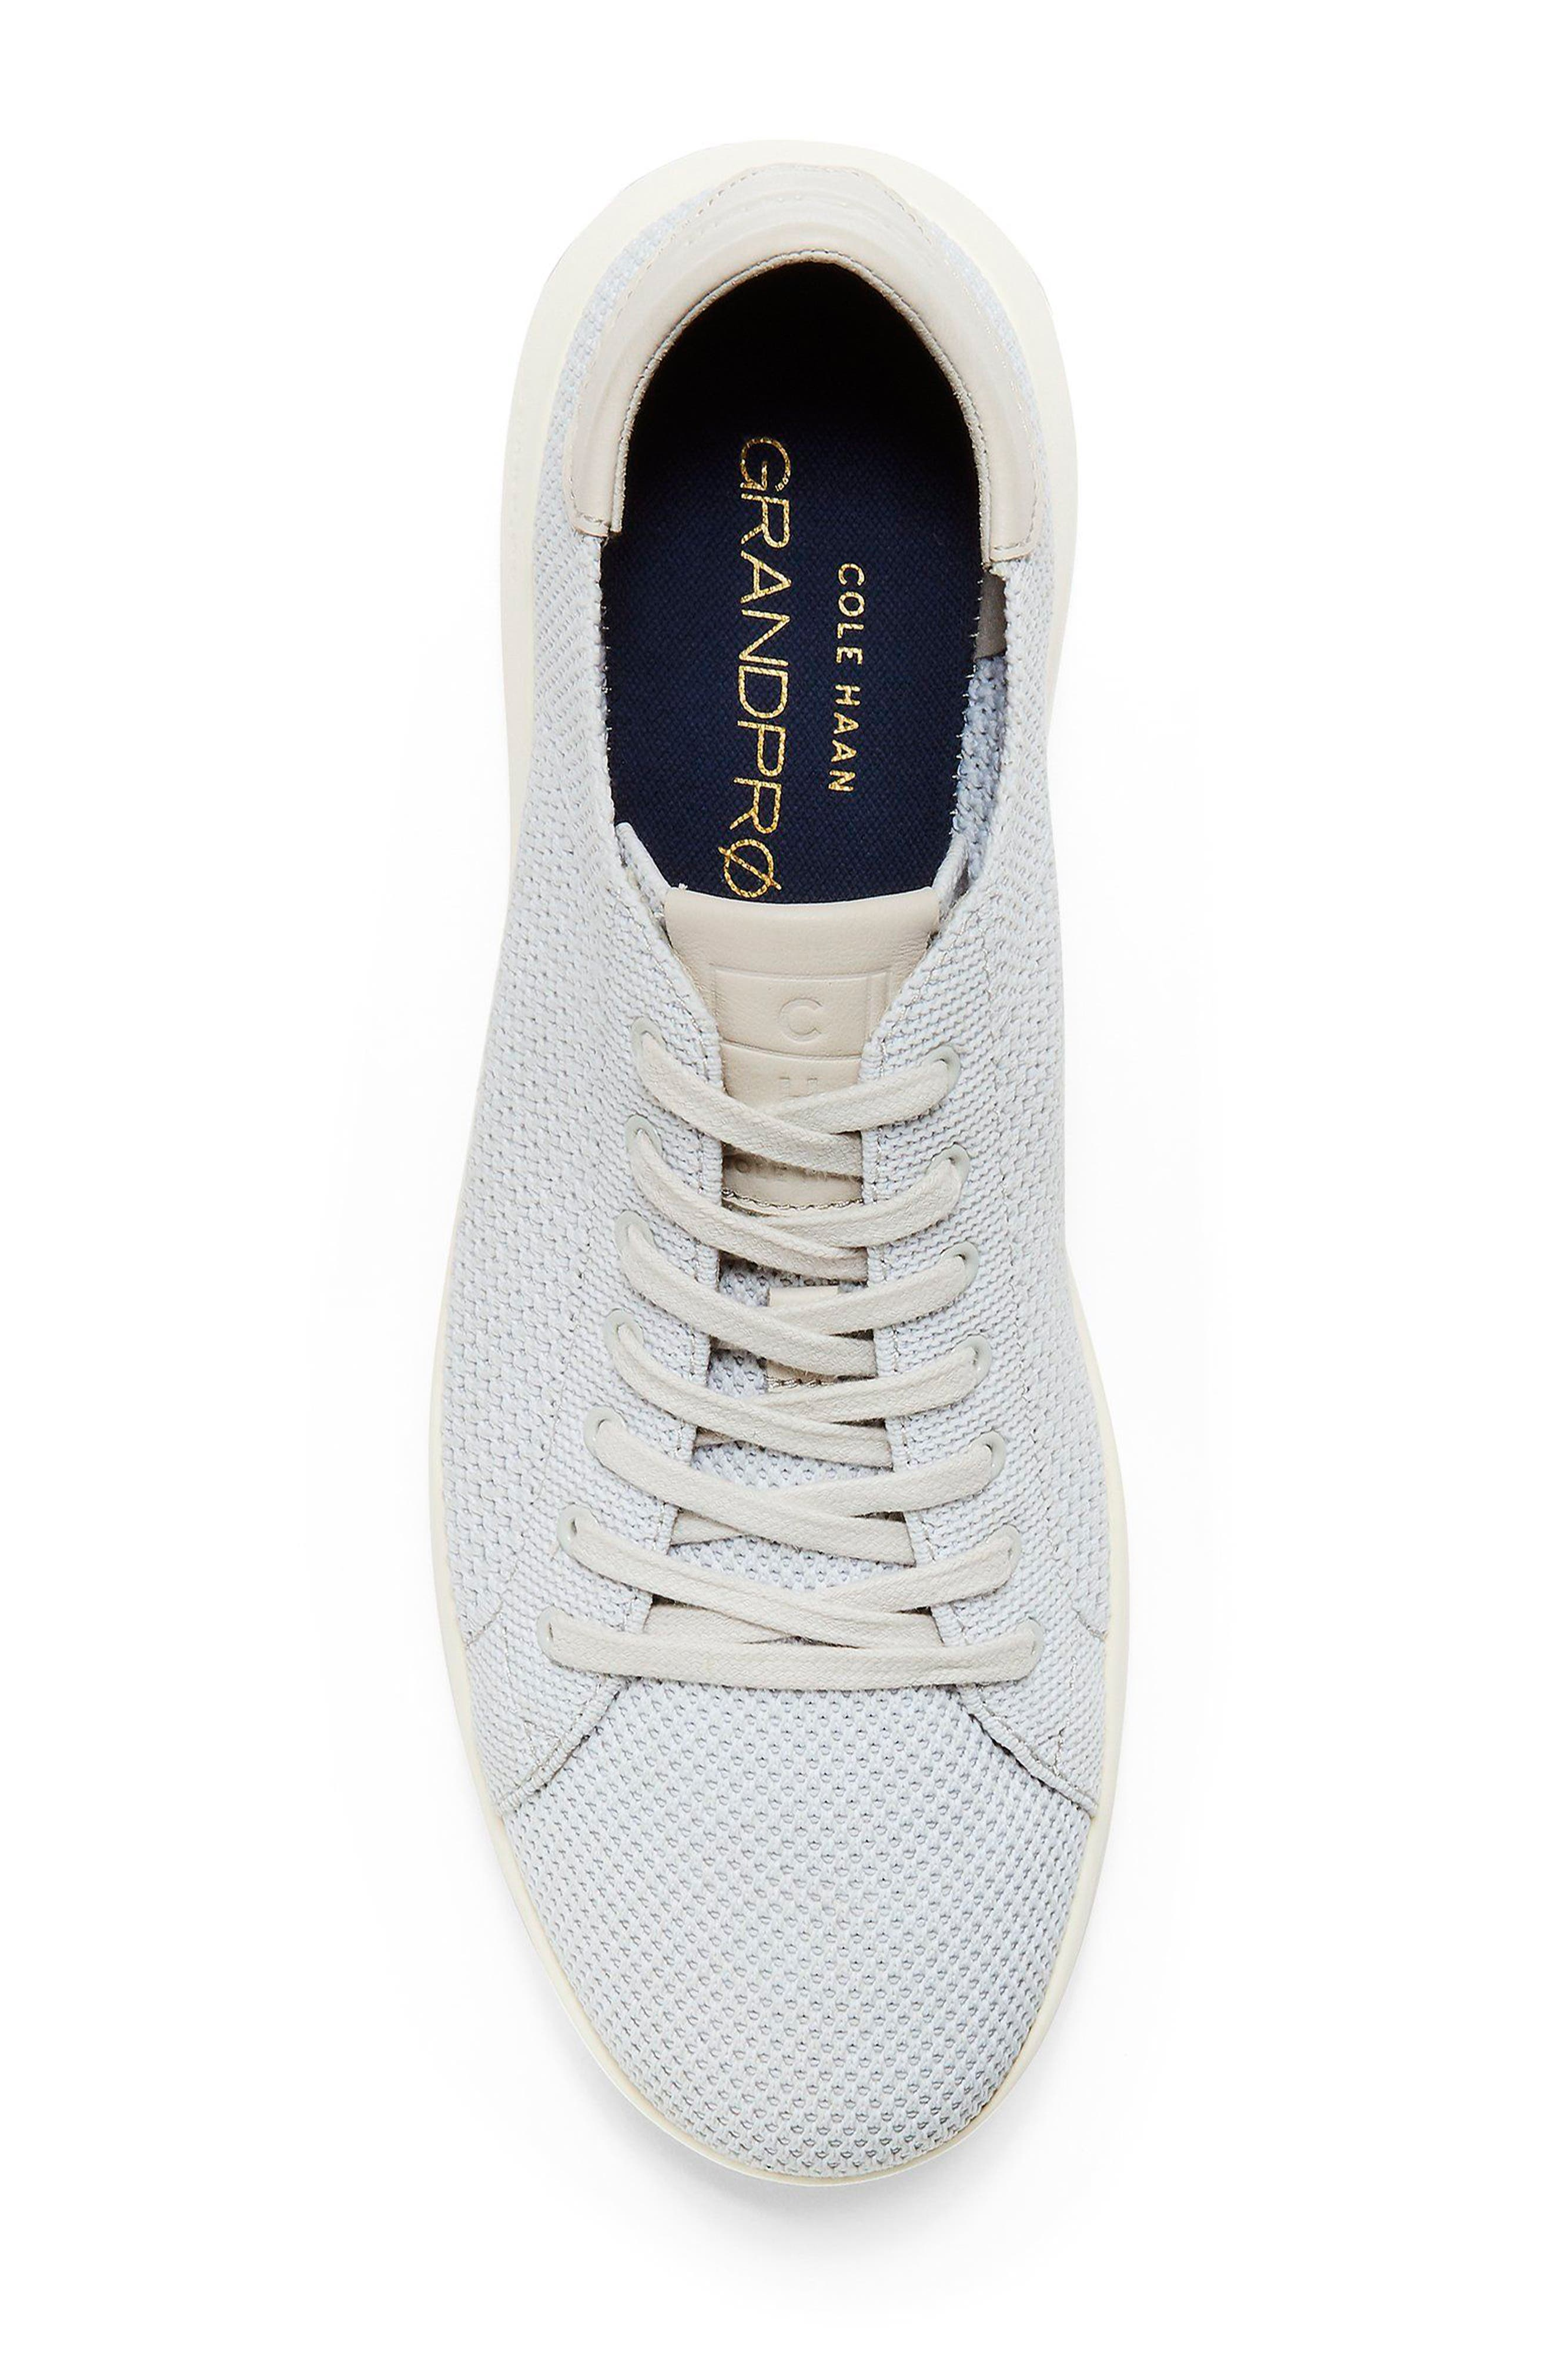 GrandPro Tennis Stitchlite Sneaker,                             Alternate thumbnail 5, color,                             Vapor Gray/ Optic White